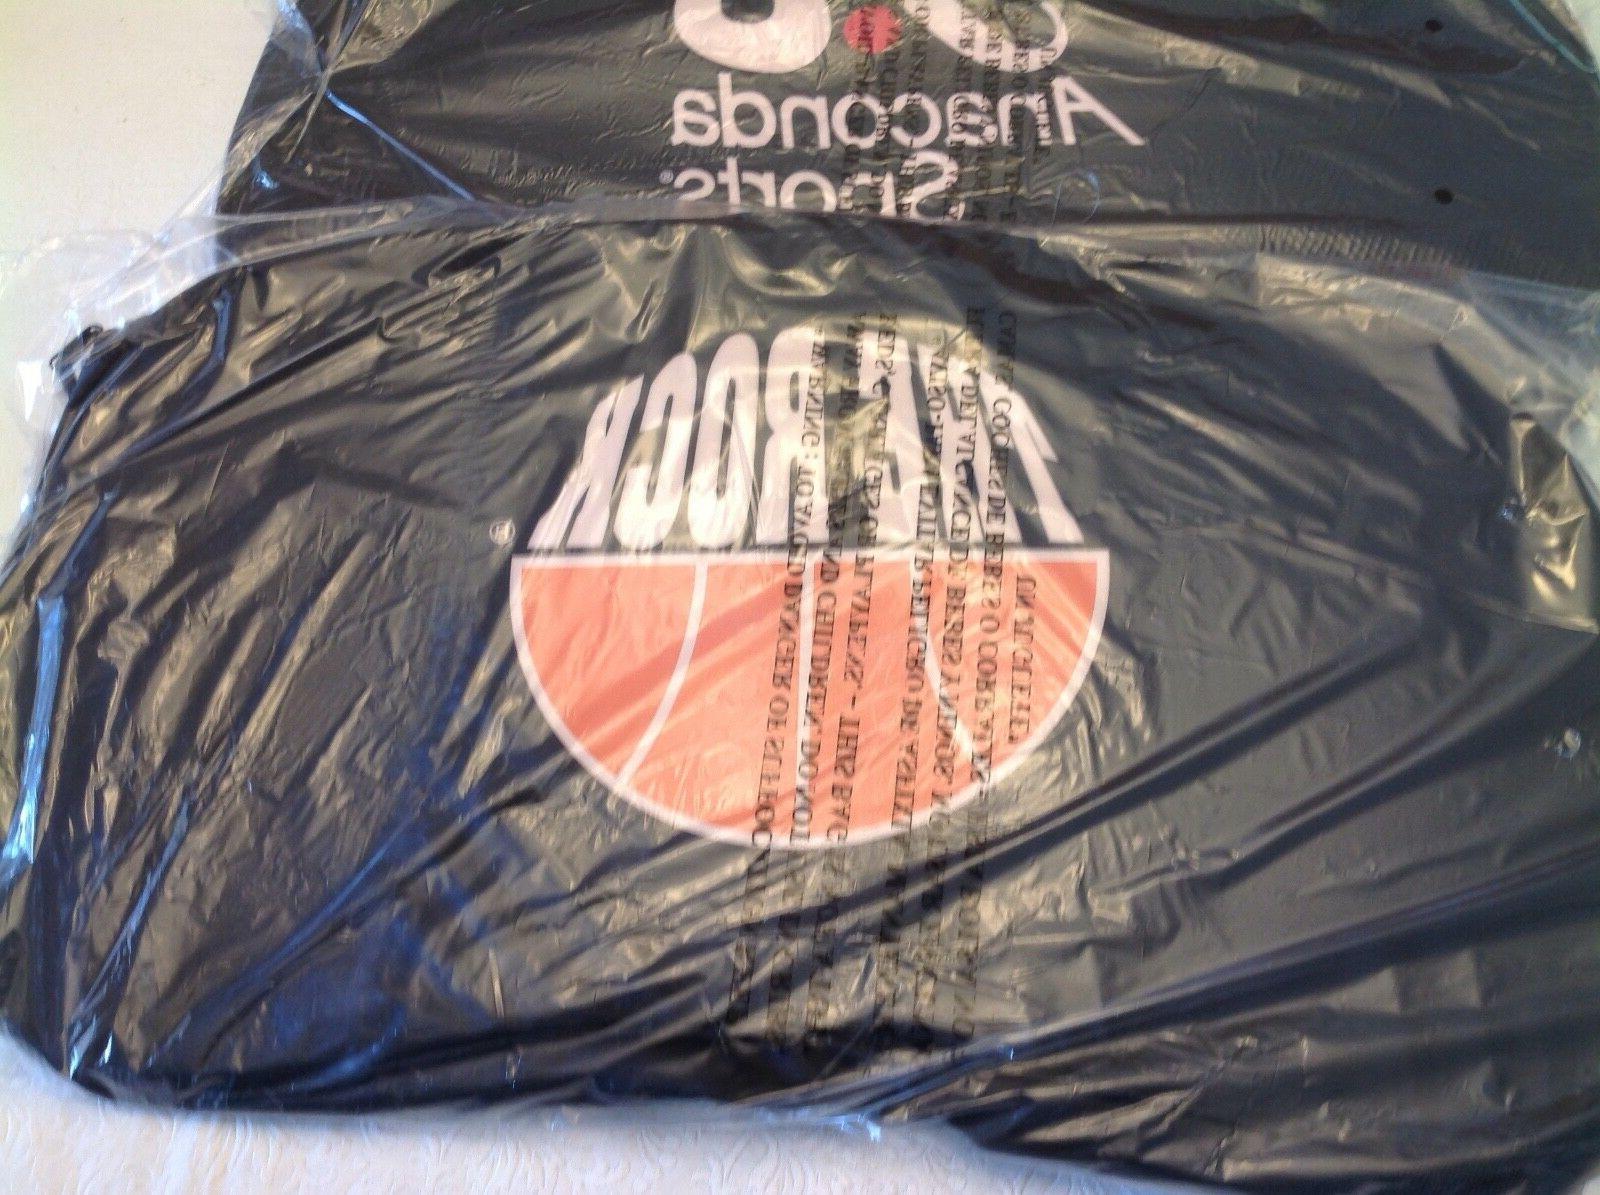 NYLON/MESH BIG BAG THE SOCCER/BASEBALL